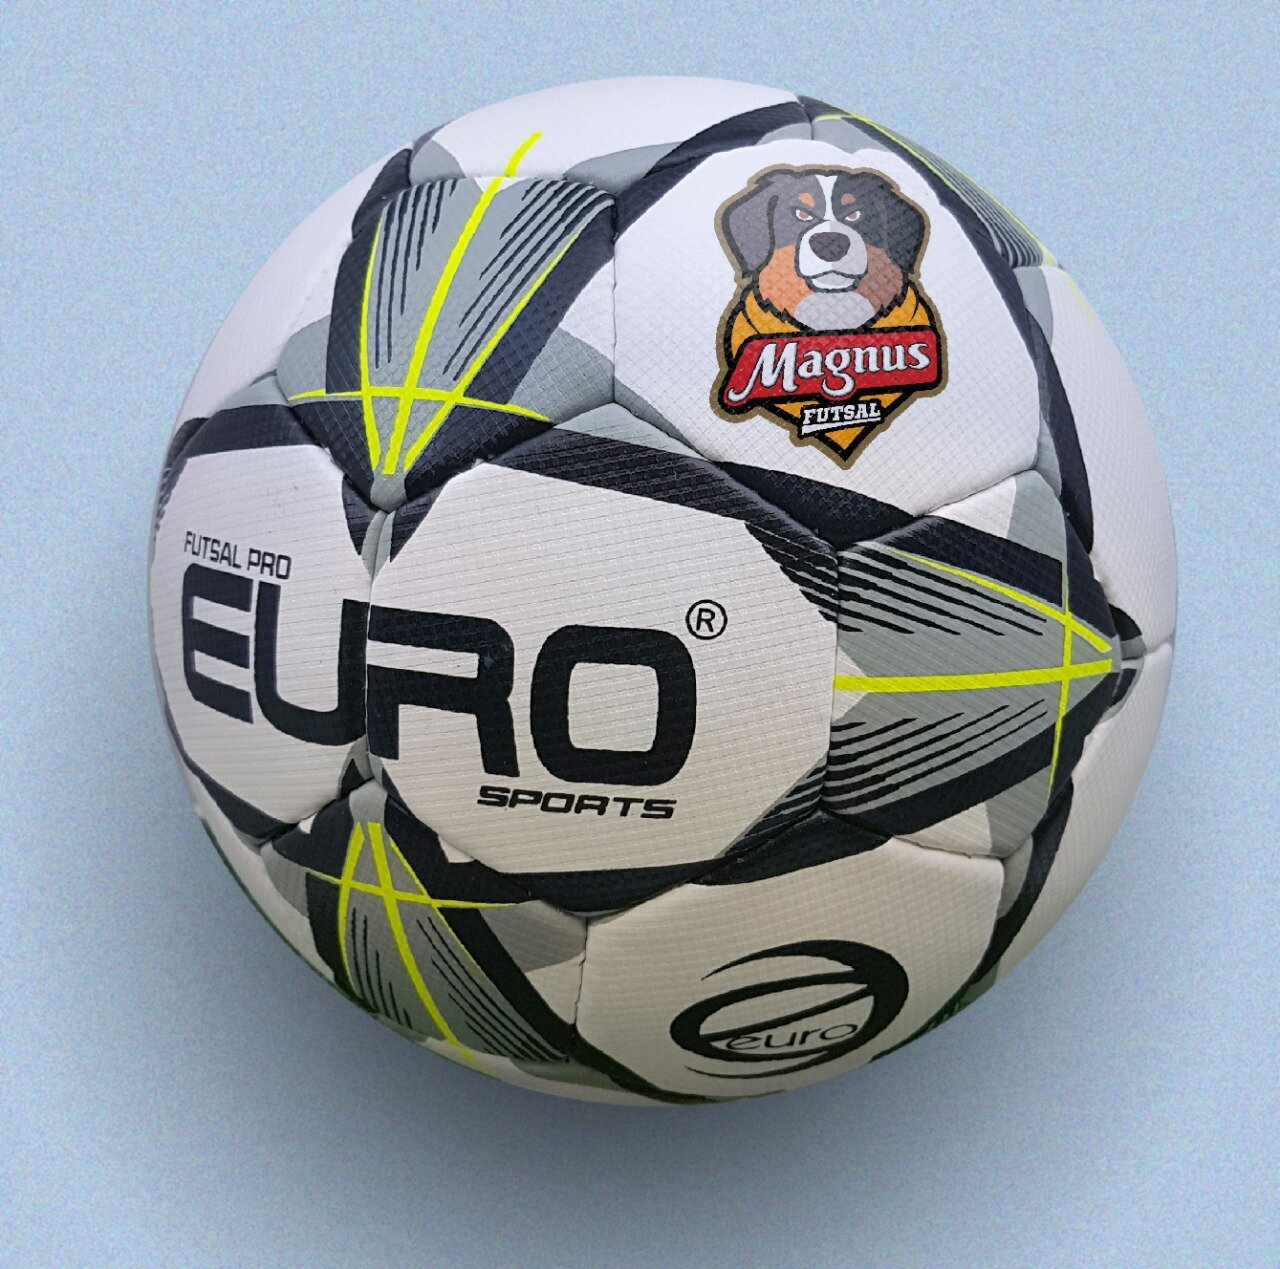 Bola Pró do Magnus Futsal